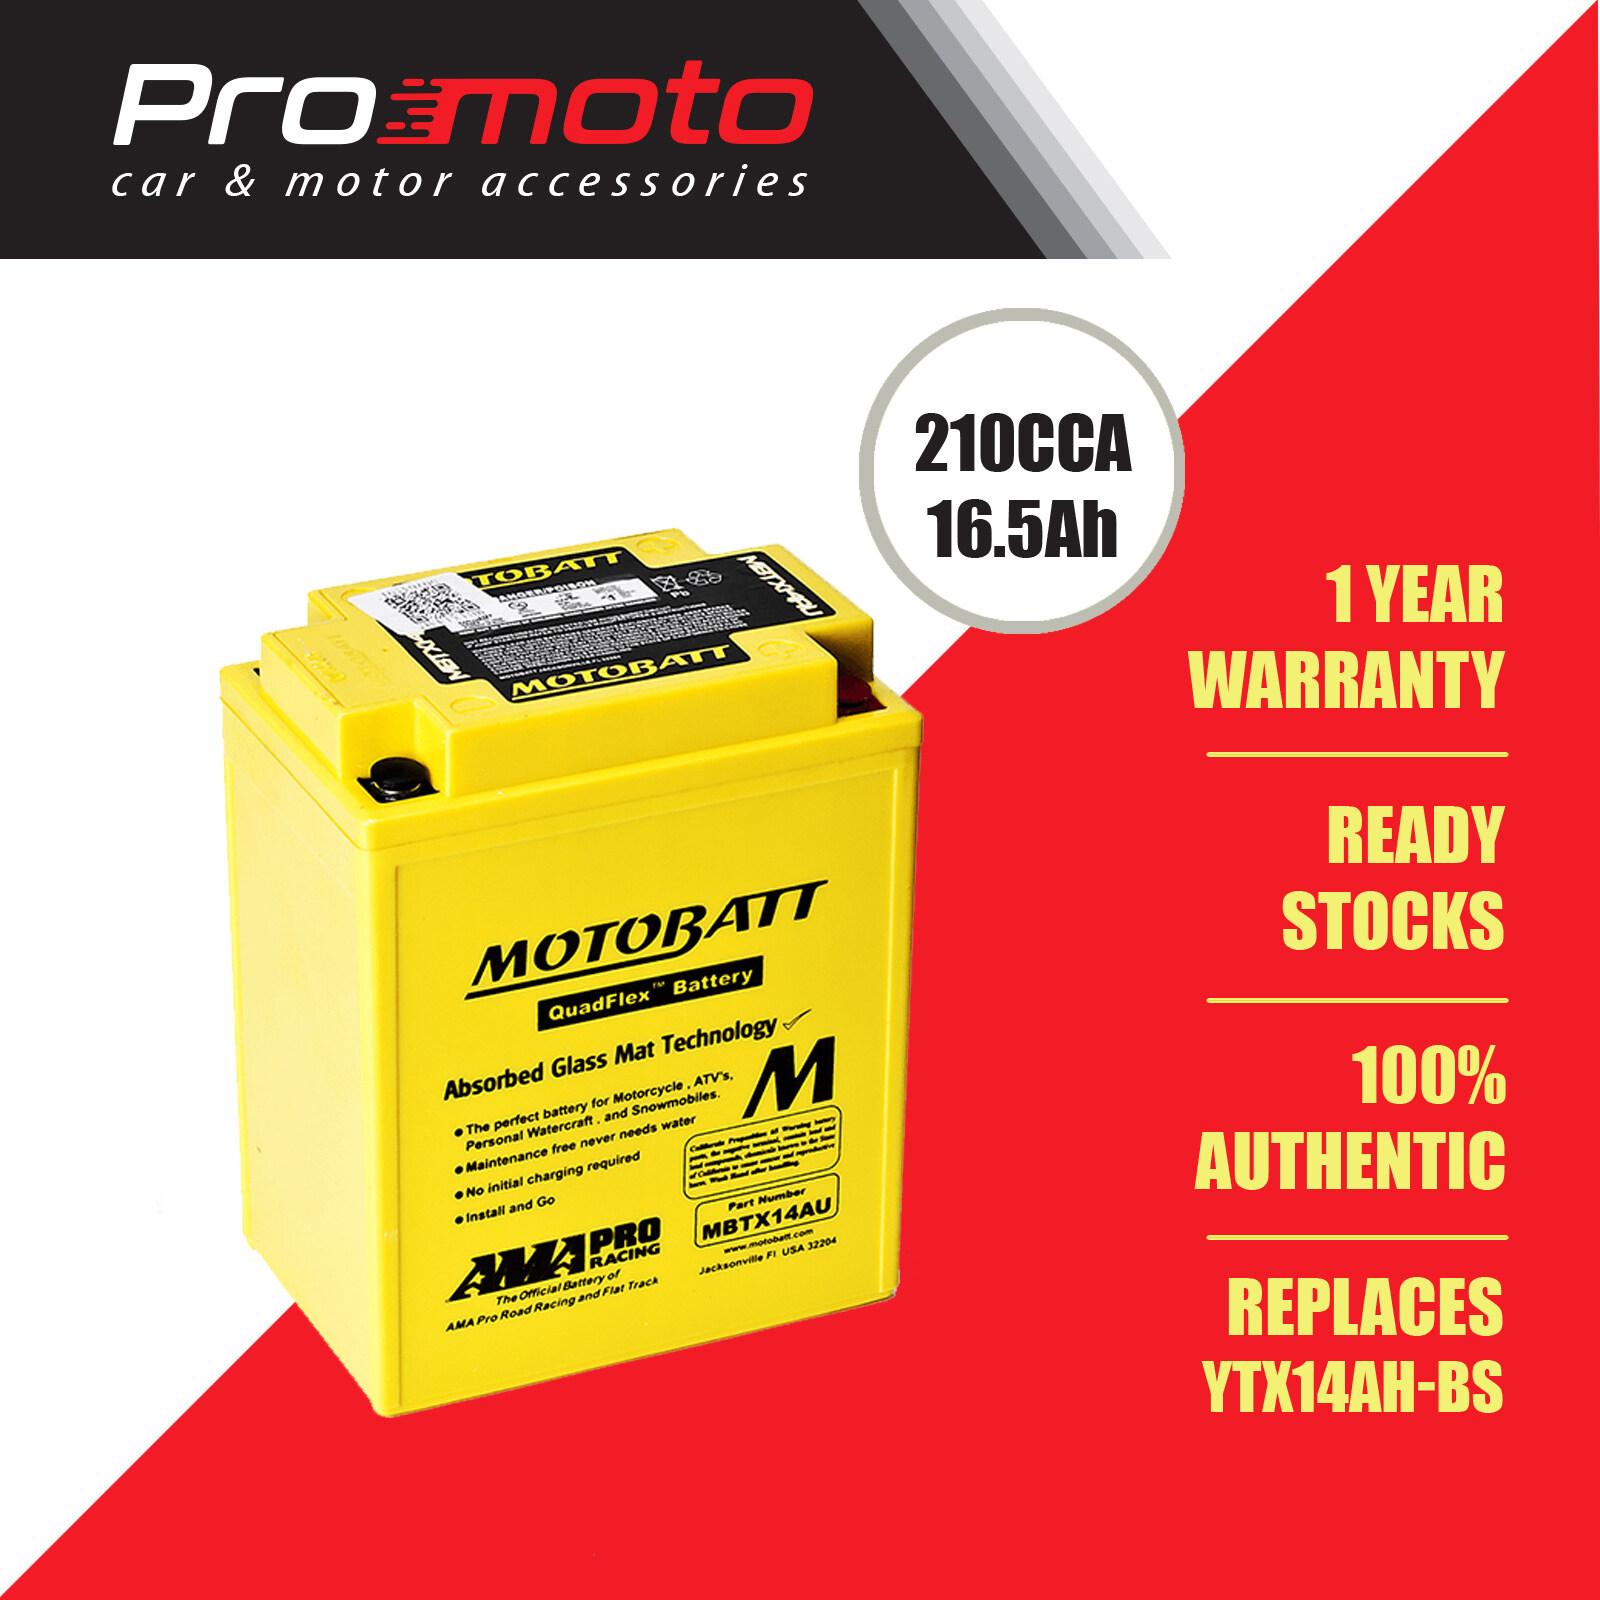 Motobatt Quadflex Battery MBTX14AU (FOR KAWASAKI, HONDA, DUCATI, APRILIA & etc) (Replaces YTX14AH-BS)